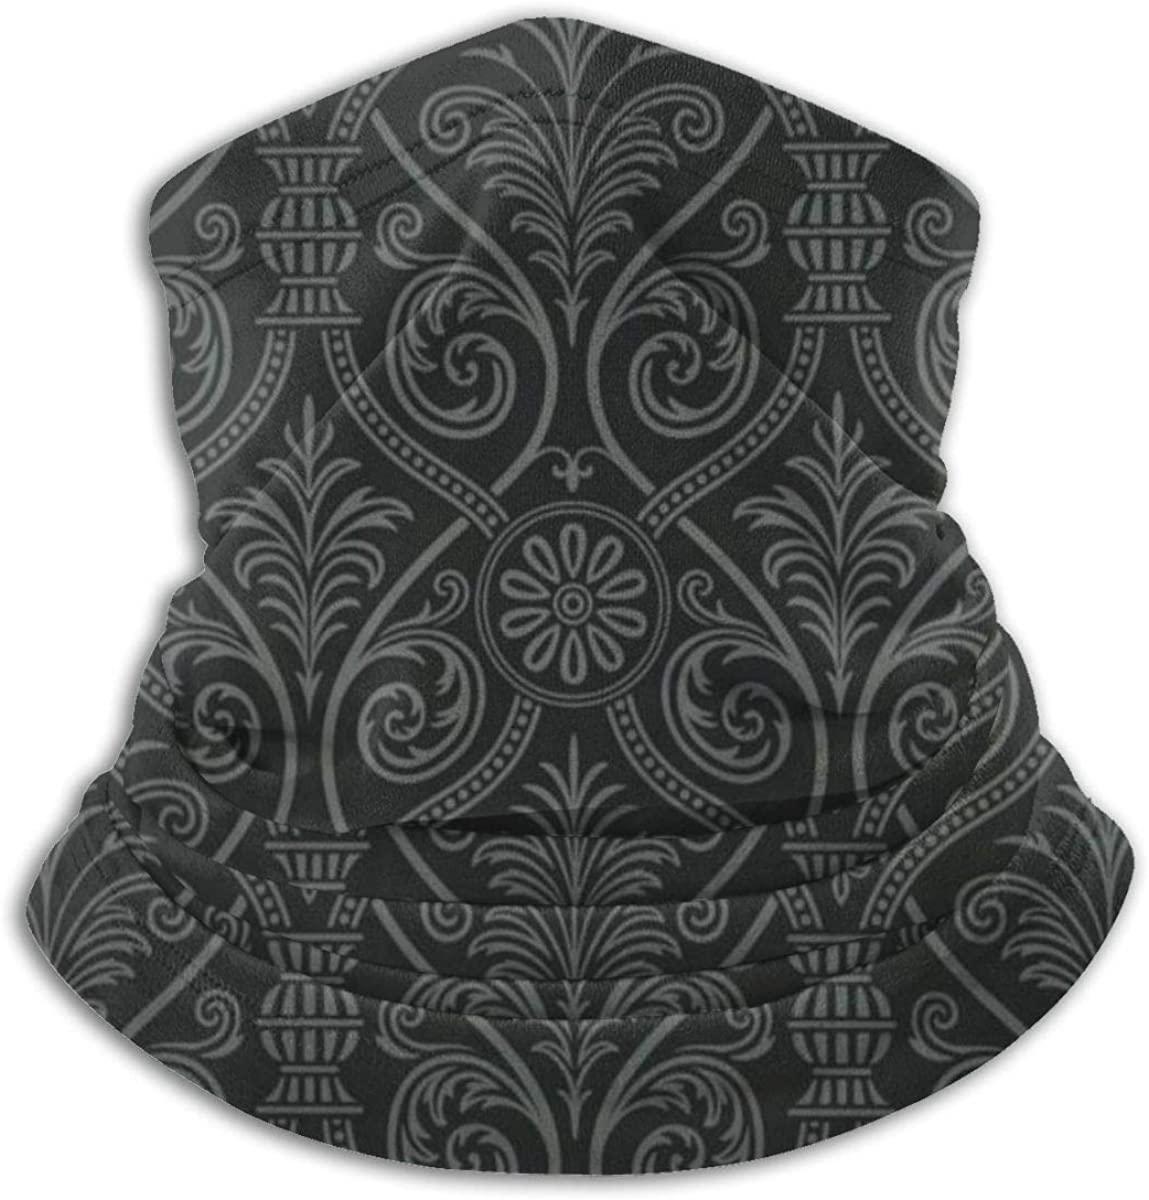 QBahoe Antique Baroque Mild Ombre Gothic Unisex Fleece Neck Warmer Windproof Winter Neck Gaiter Cold Weather Face Mask for Men Women